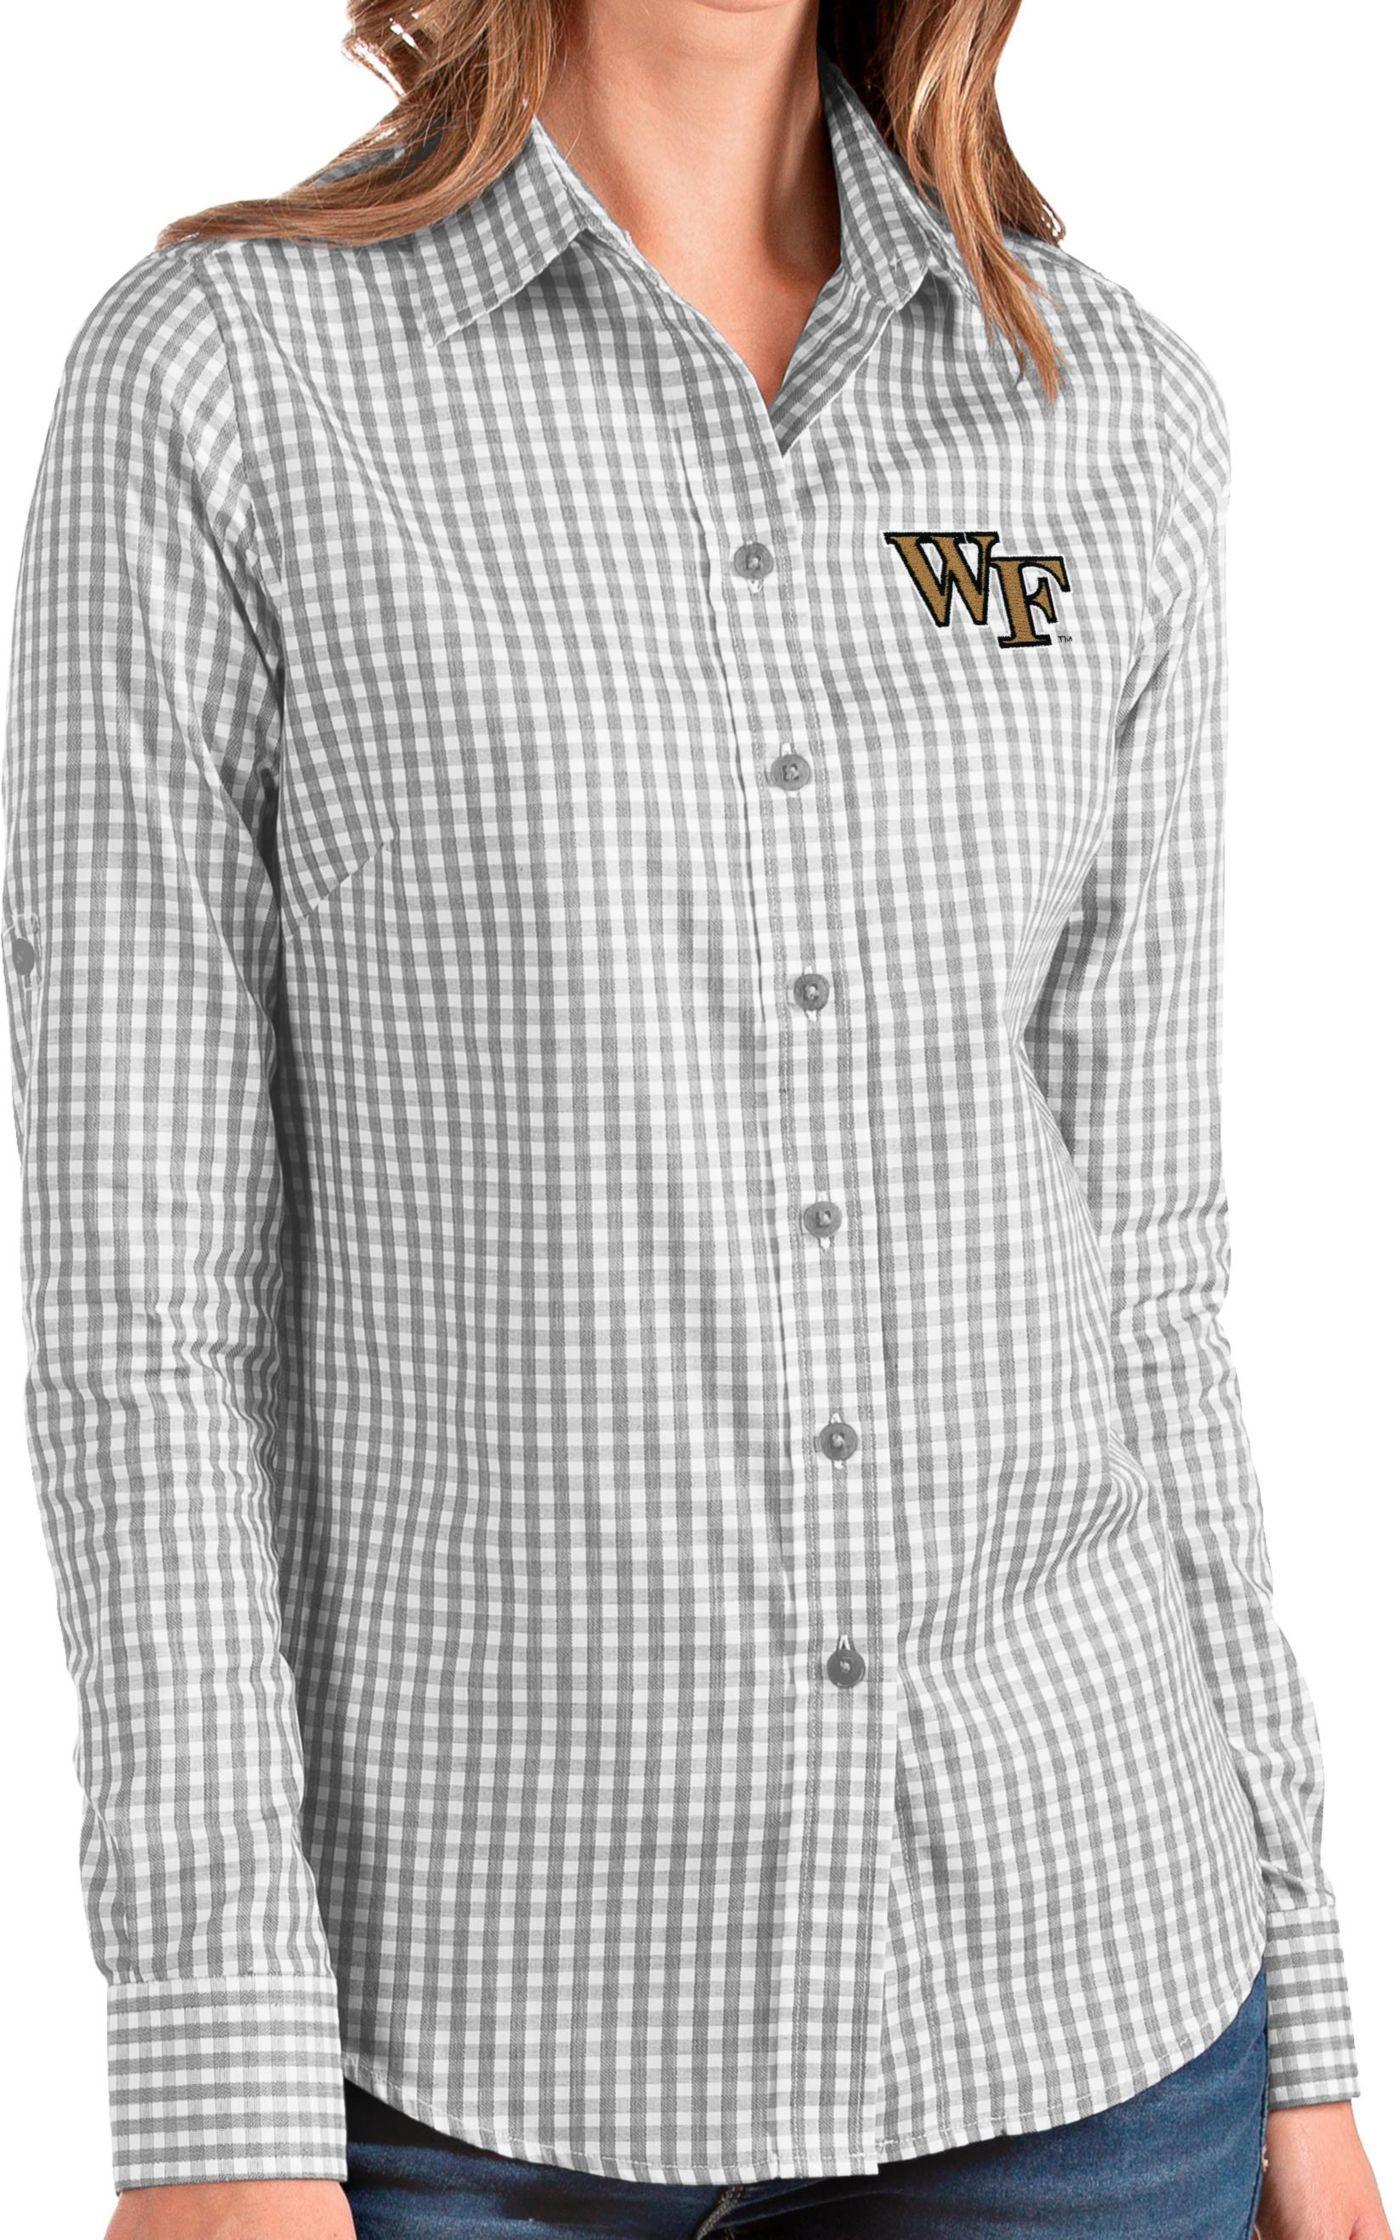 Antigua Women's Wake Forest Demon Deacons Grey Structure Button Down Long Sleeve Shirt